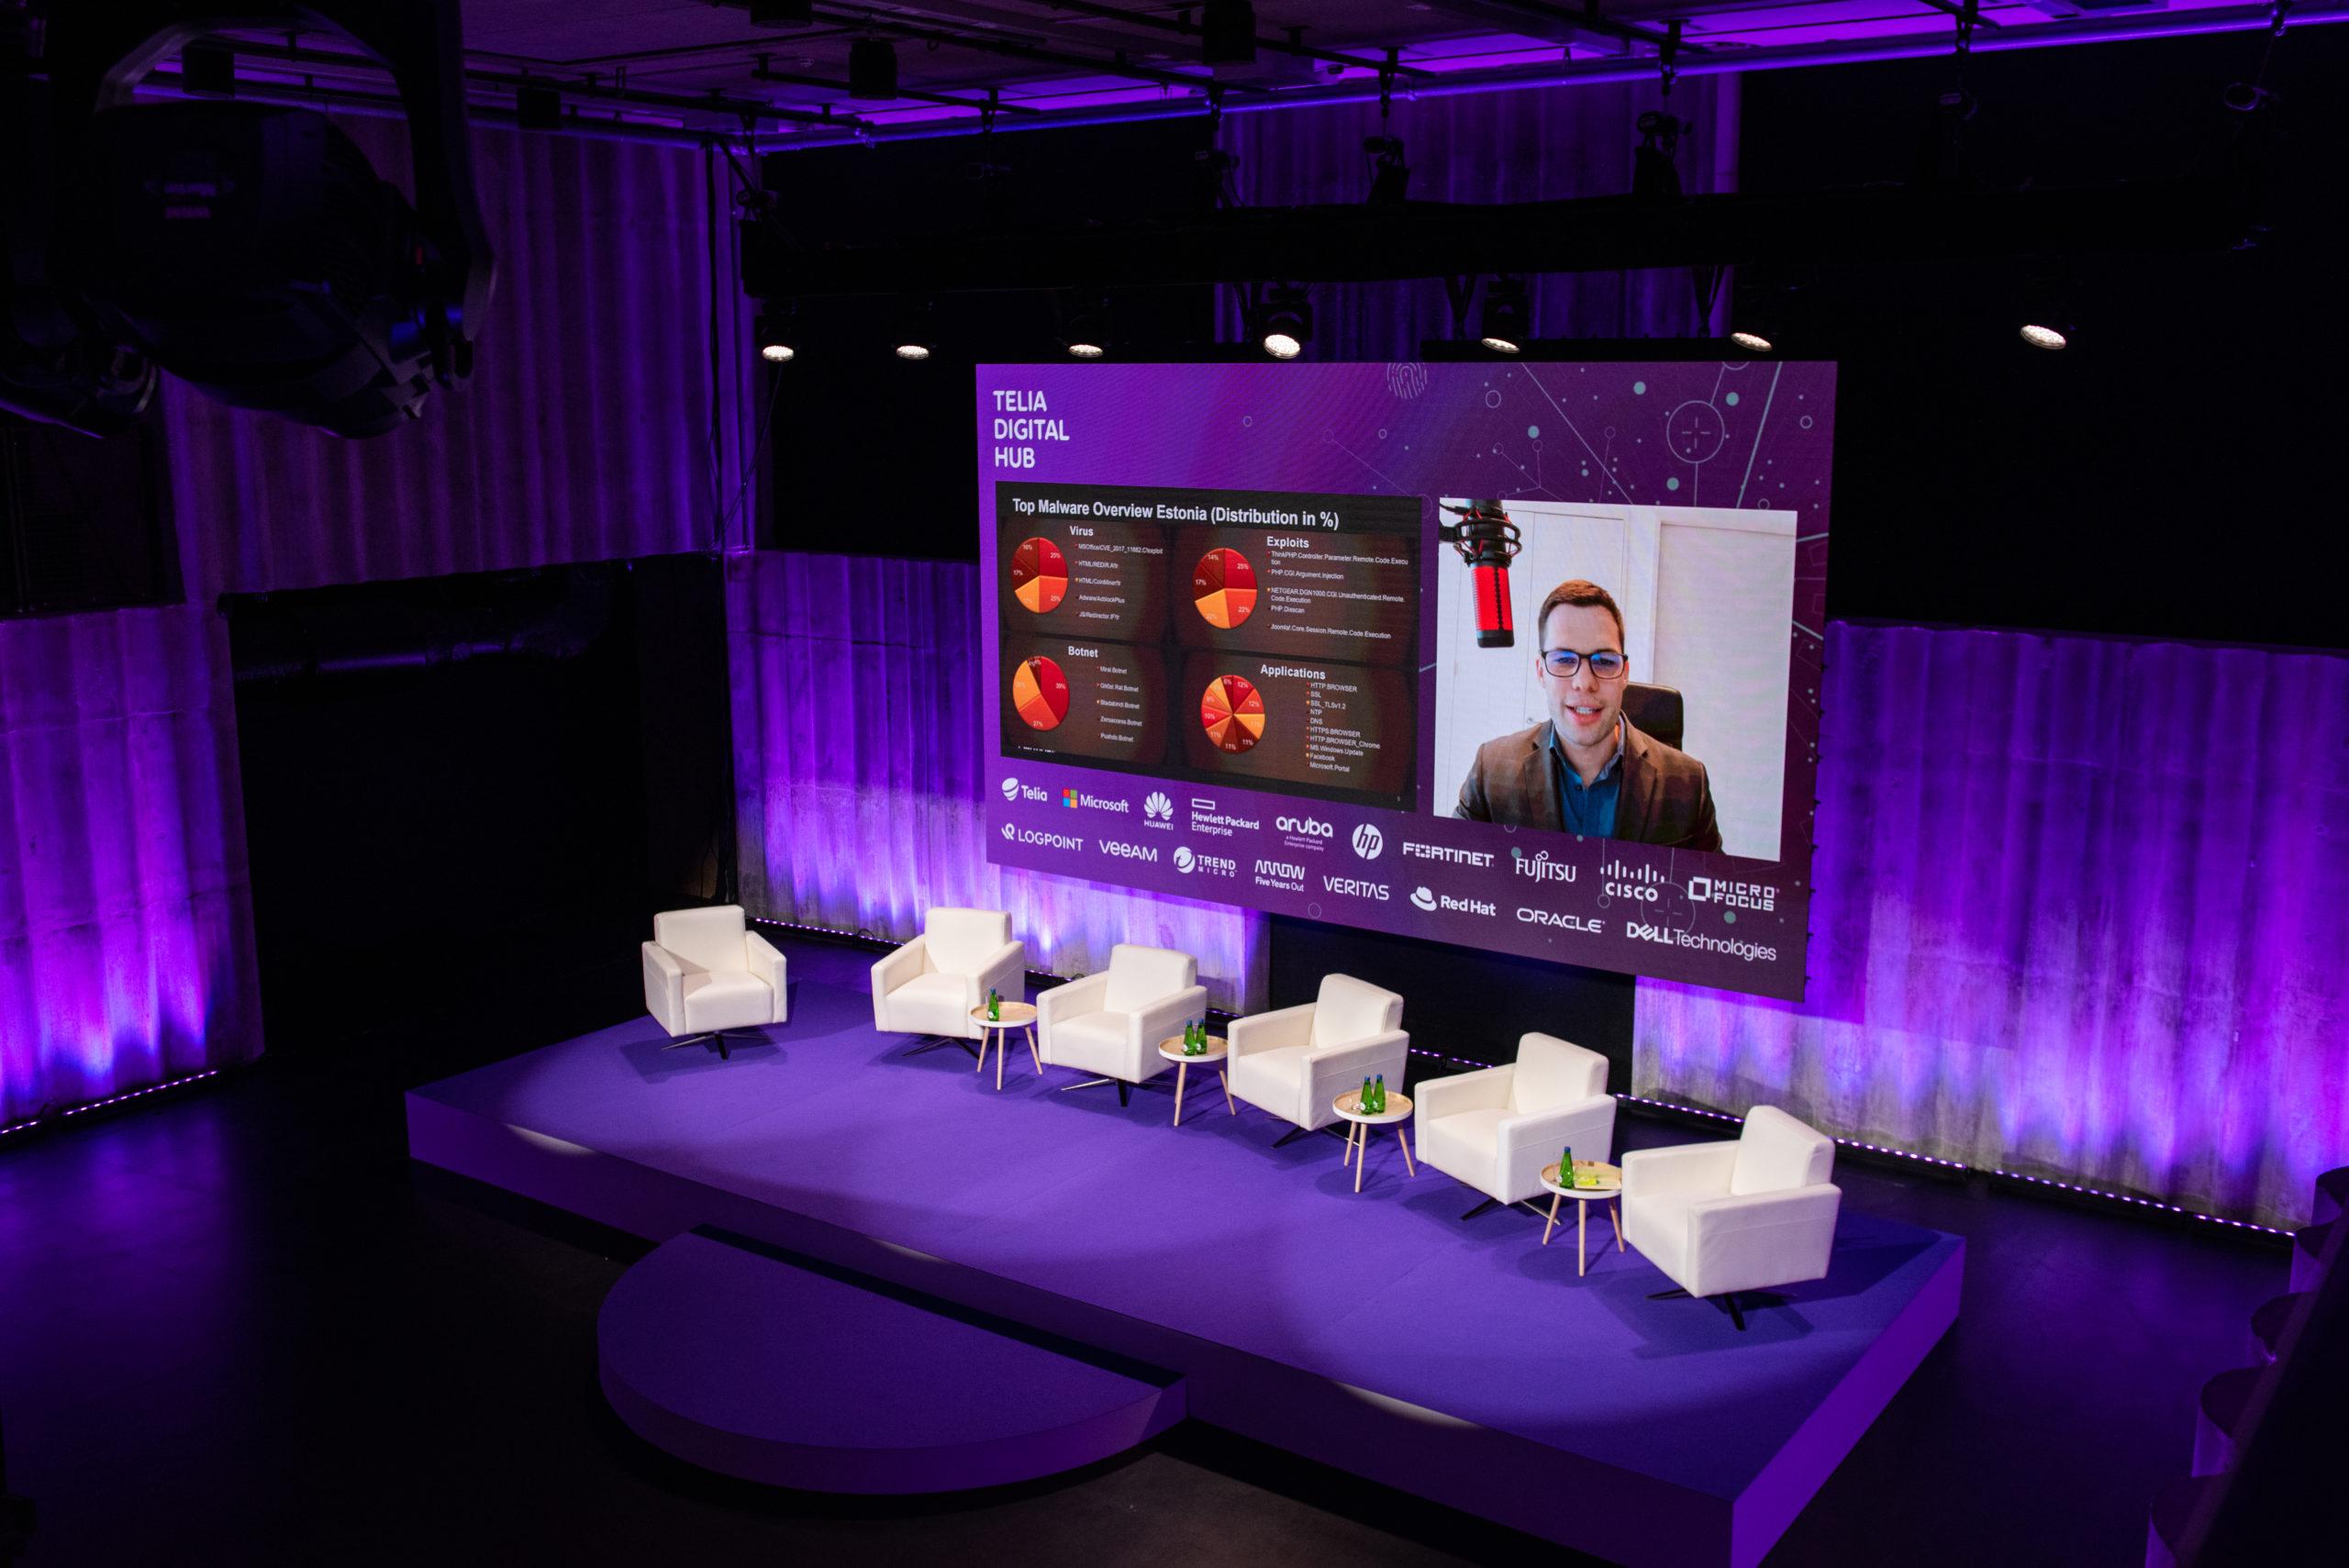 virtual stage of Telia event